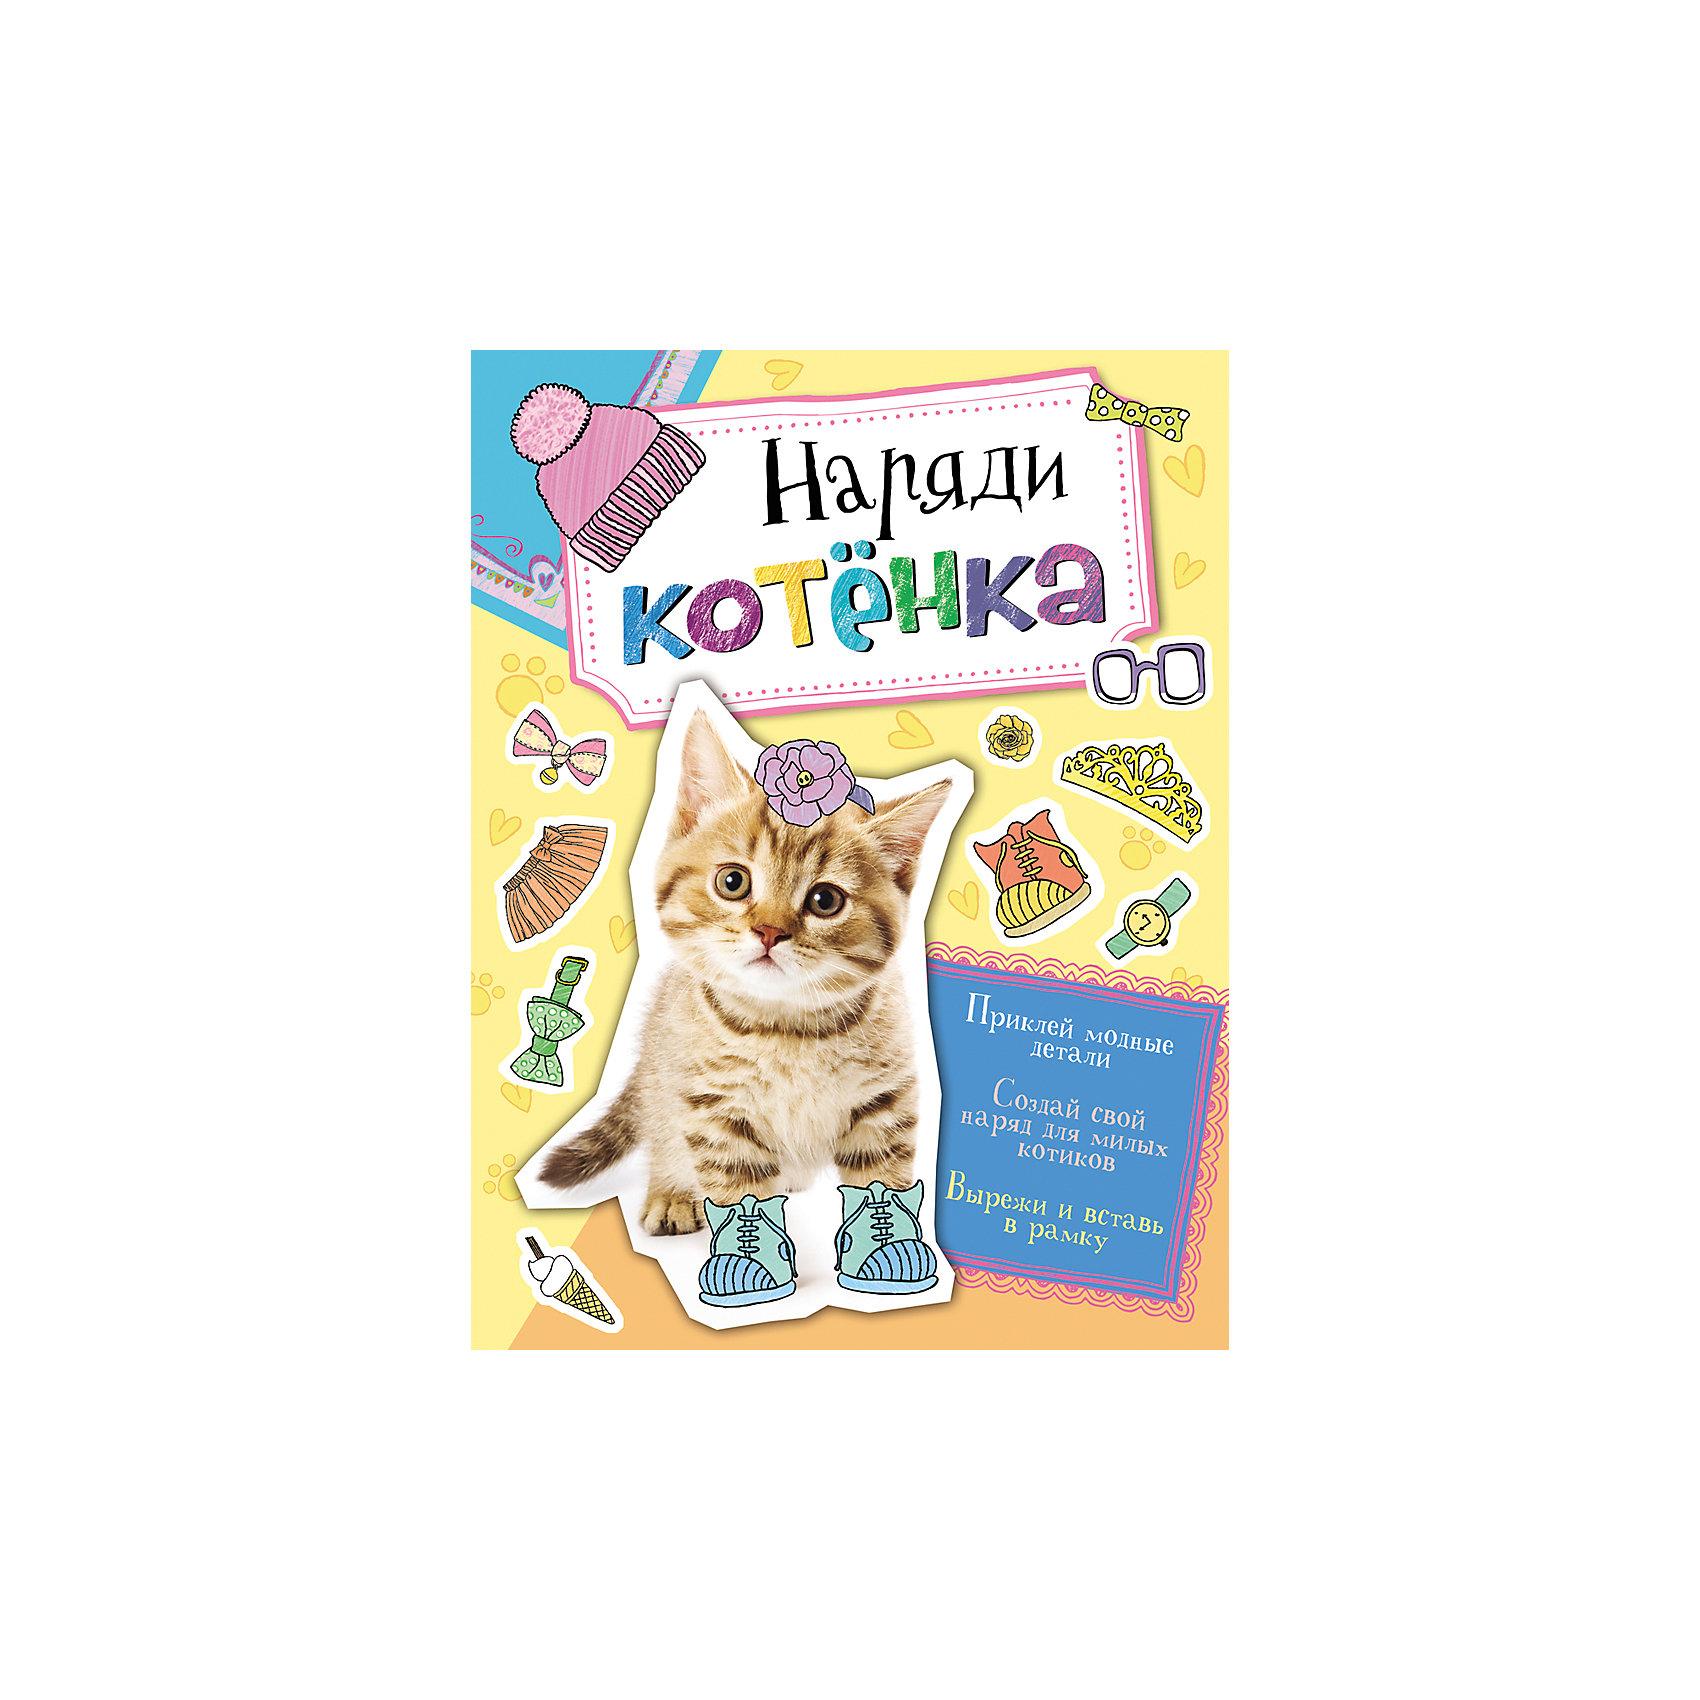 Росмэн Наряди котенка куплю вислоухого котенка в красноярске